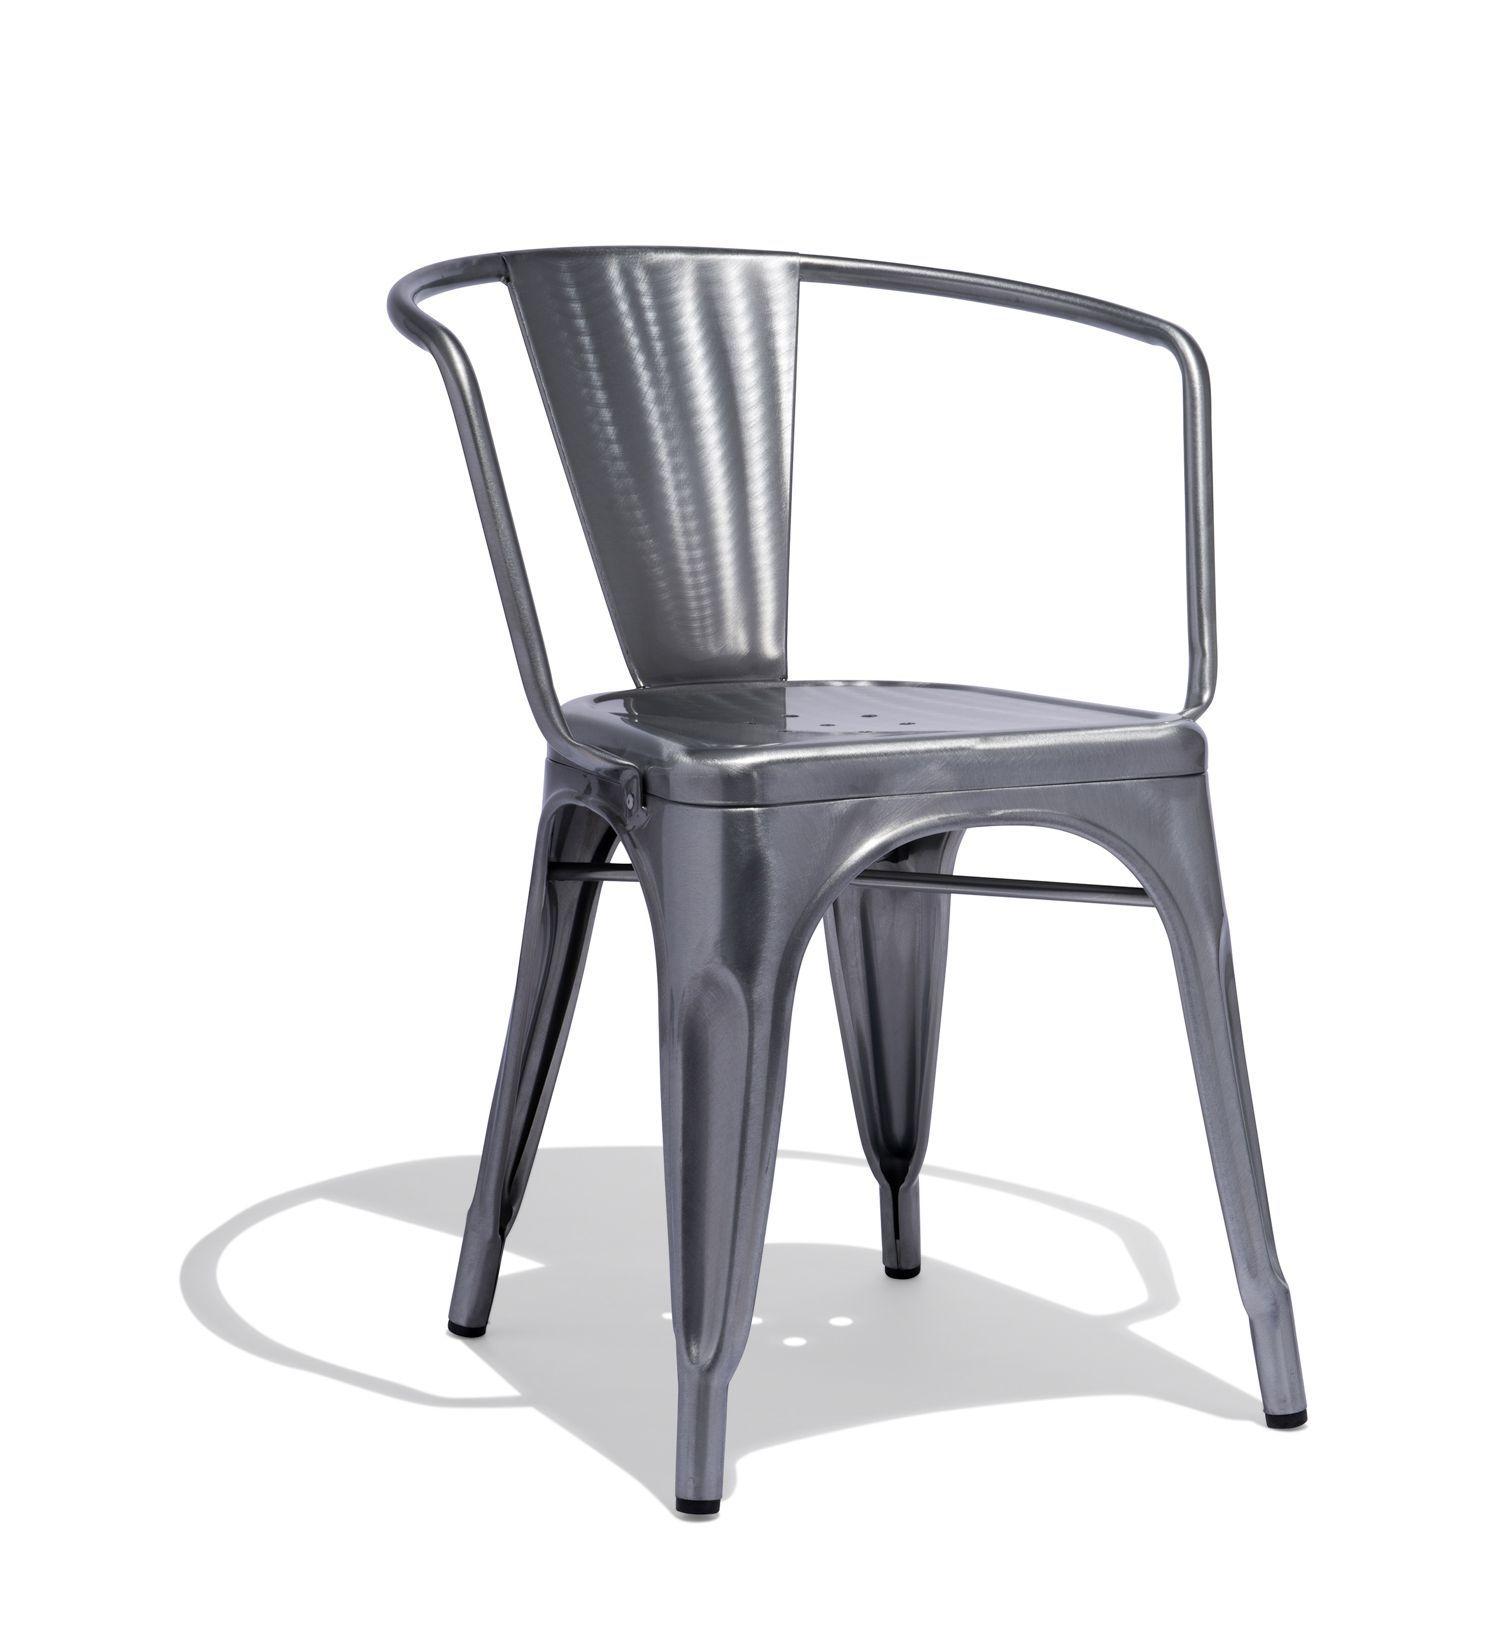 Marais Armchair | Armchair, Chair, Outdoor chairs